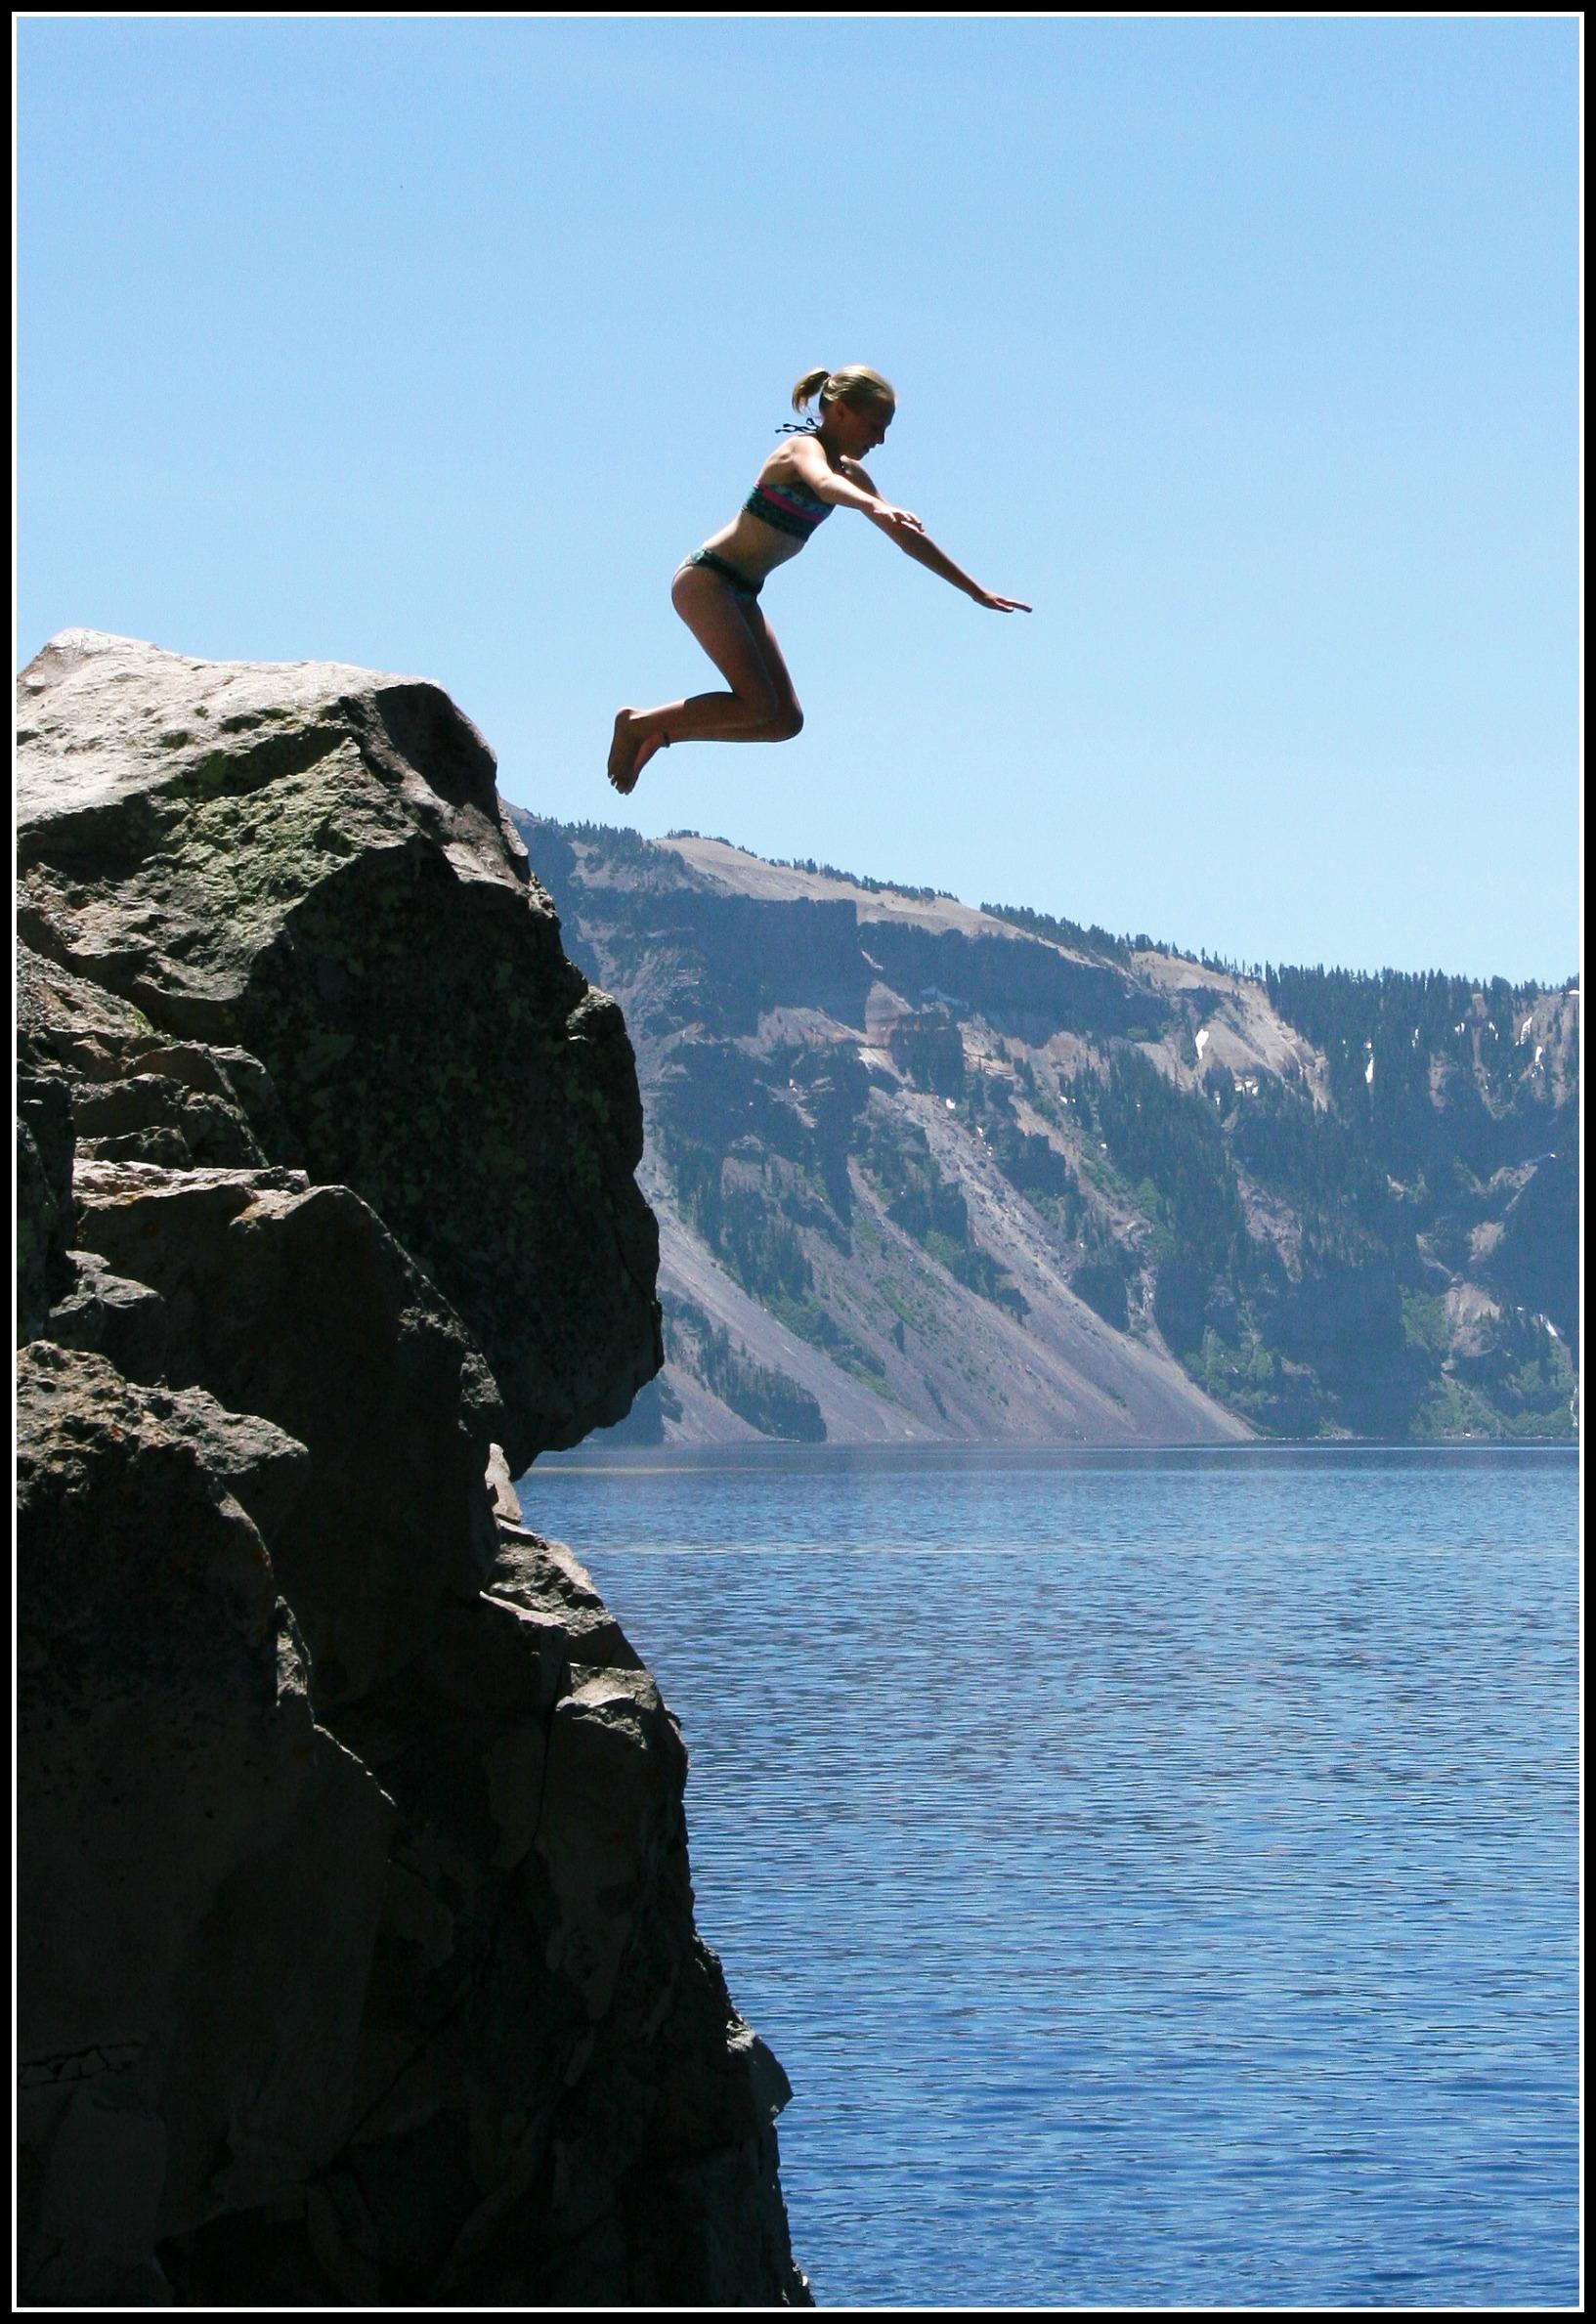 Falling Bridge Wallpaper Free Jump Person Cliparts Download Free Clip Art Free